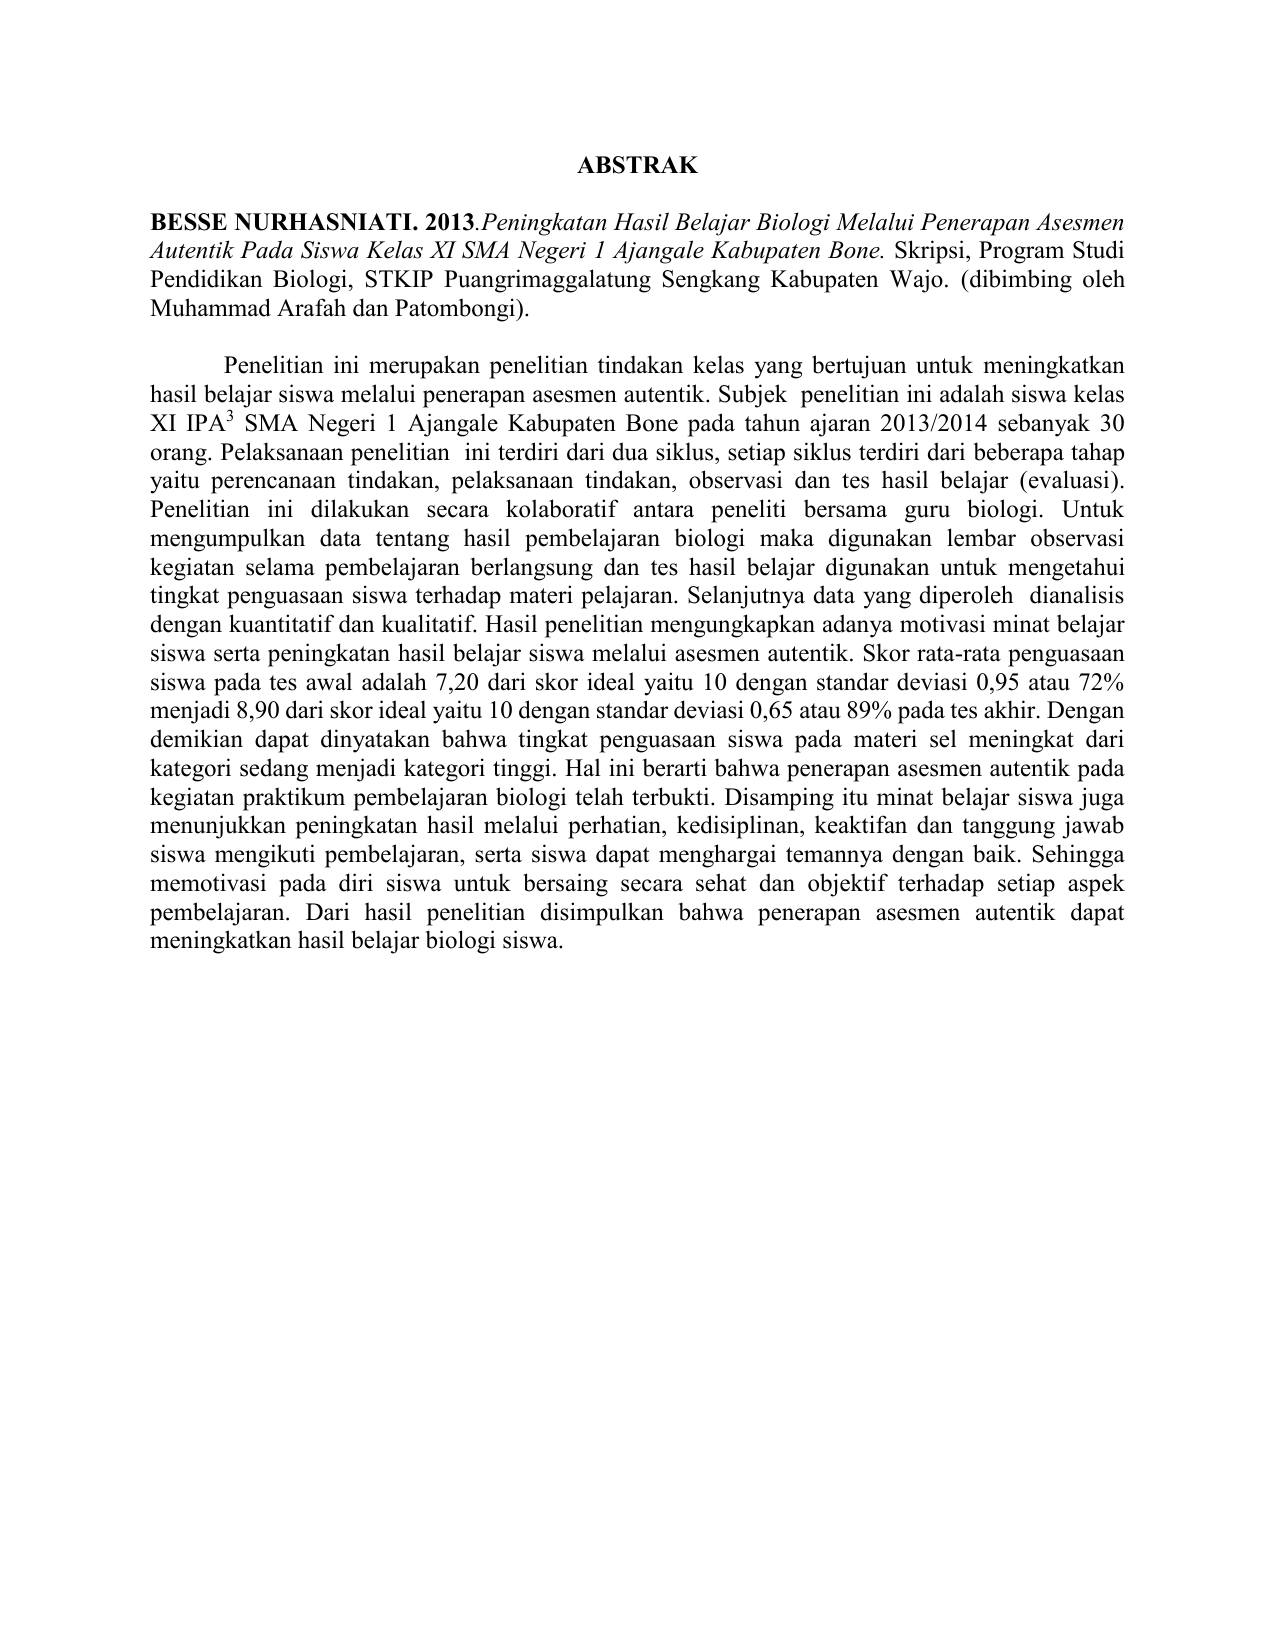 Doc Contoh Abstrak Skripsi Fadhlul Rahman Academia Edu